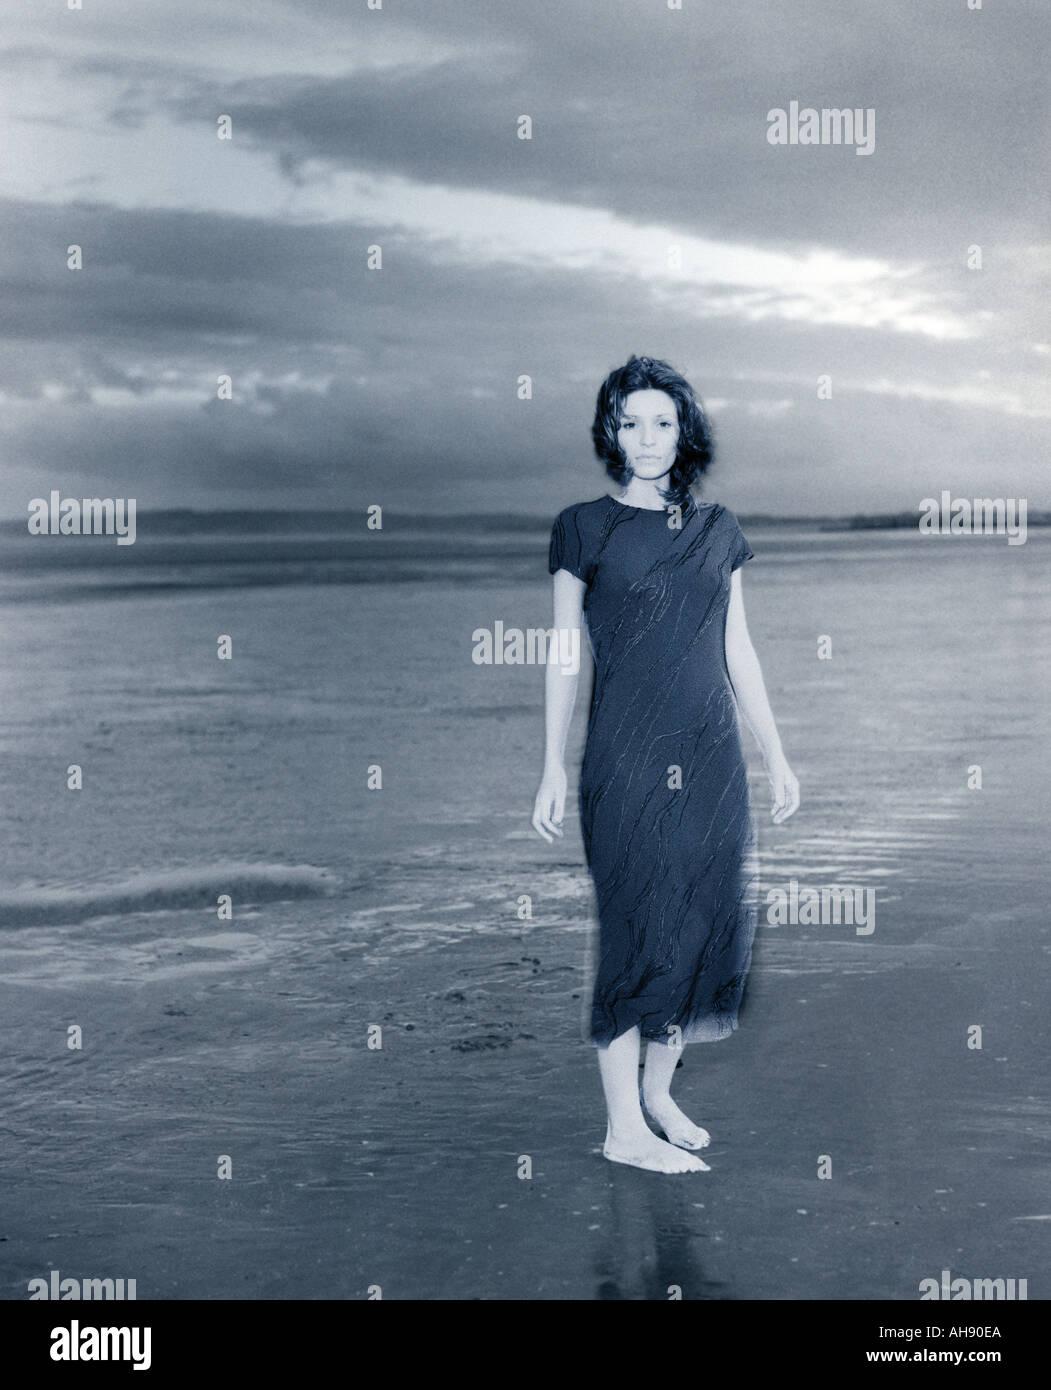 Ghost on beach - Stock Image